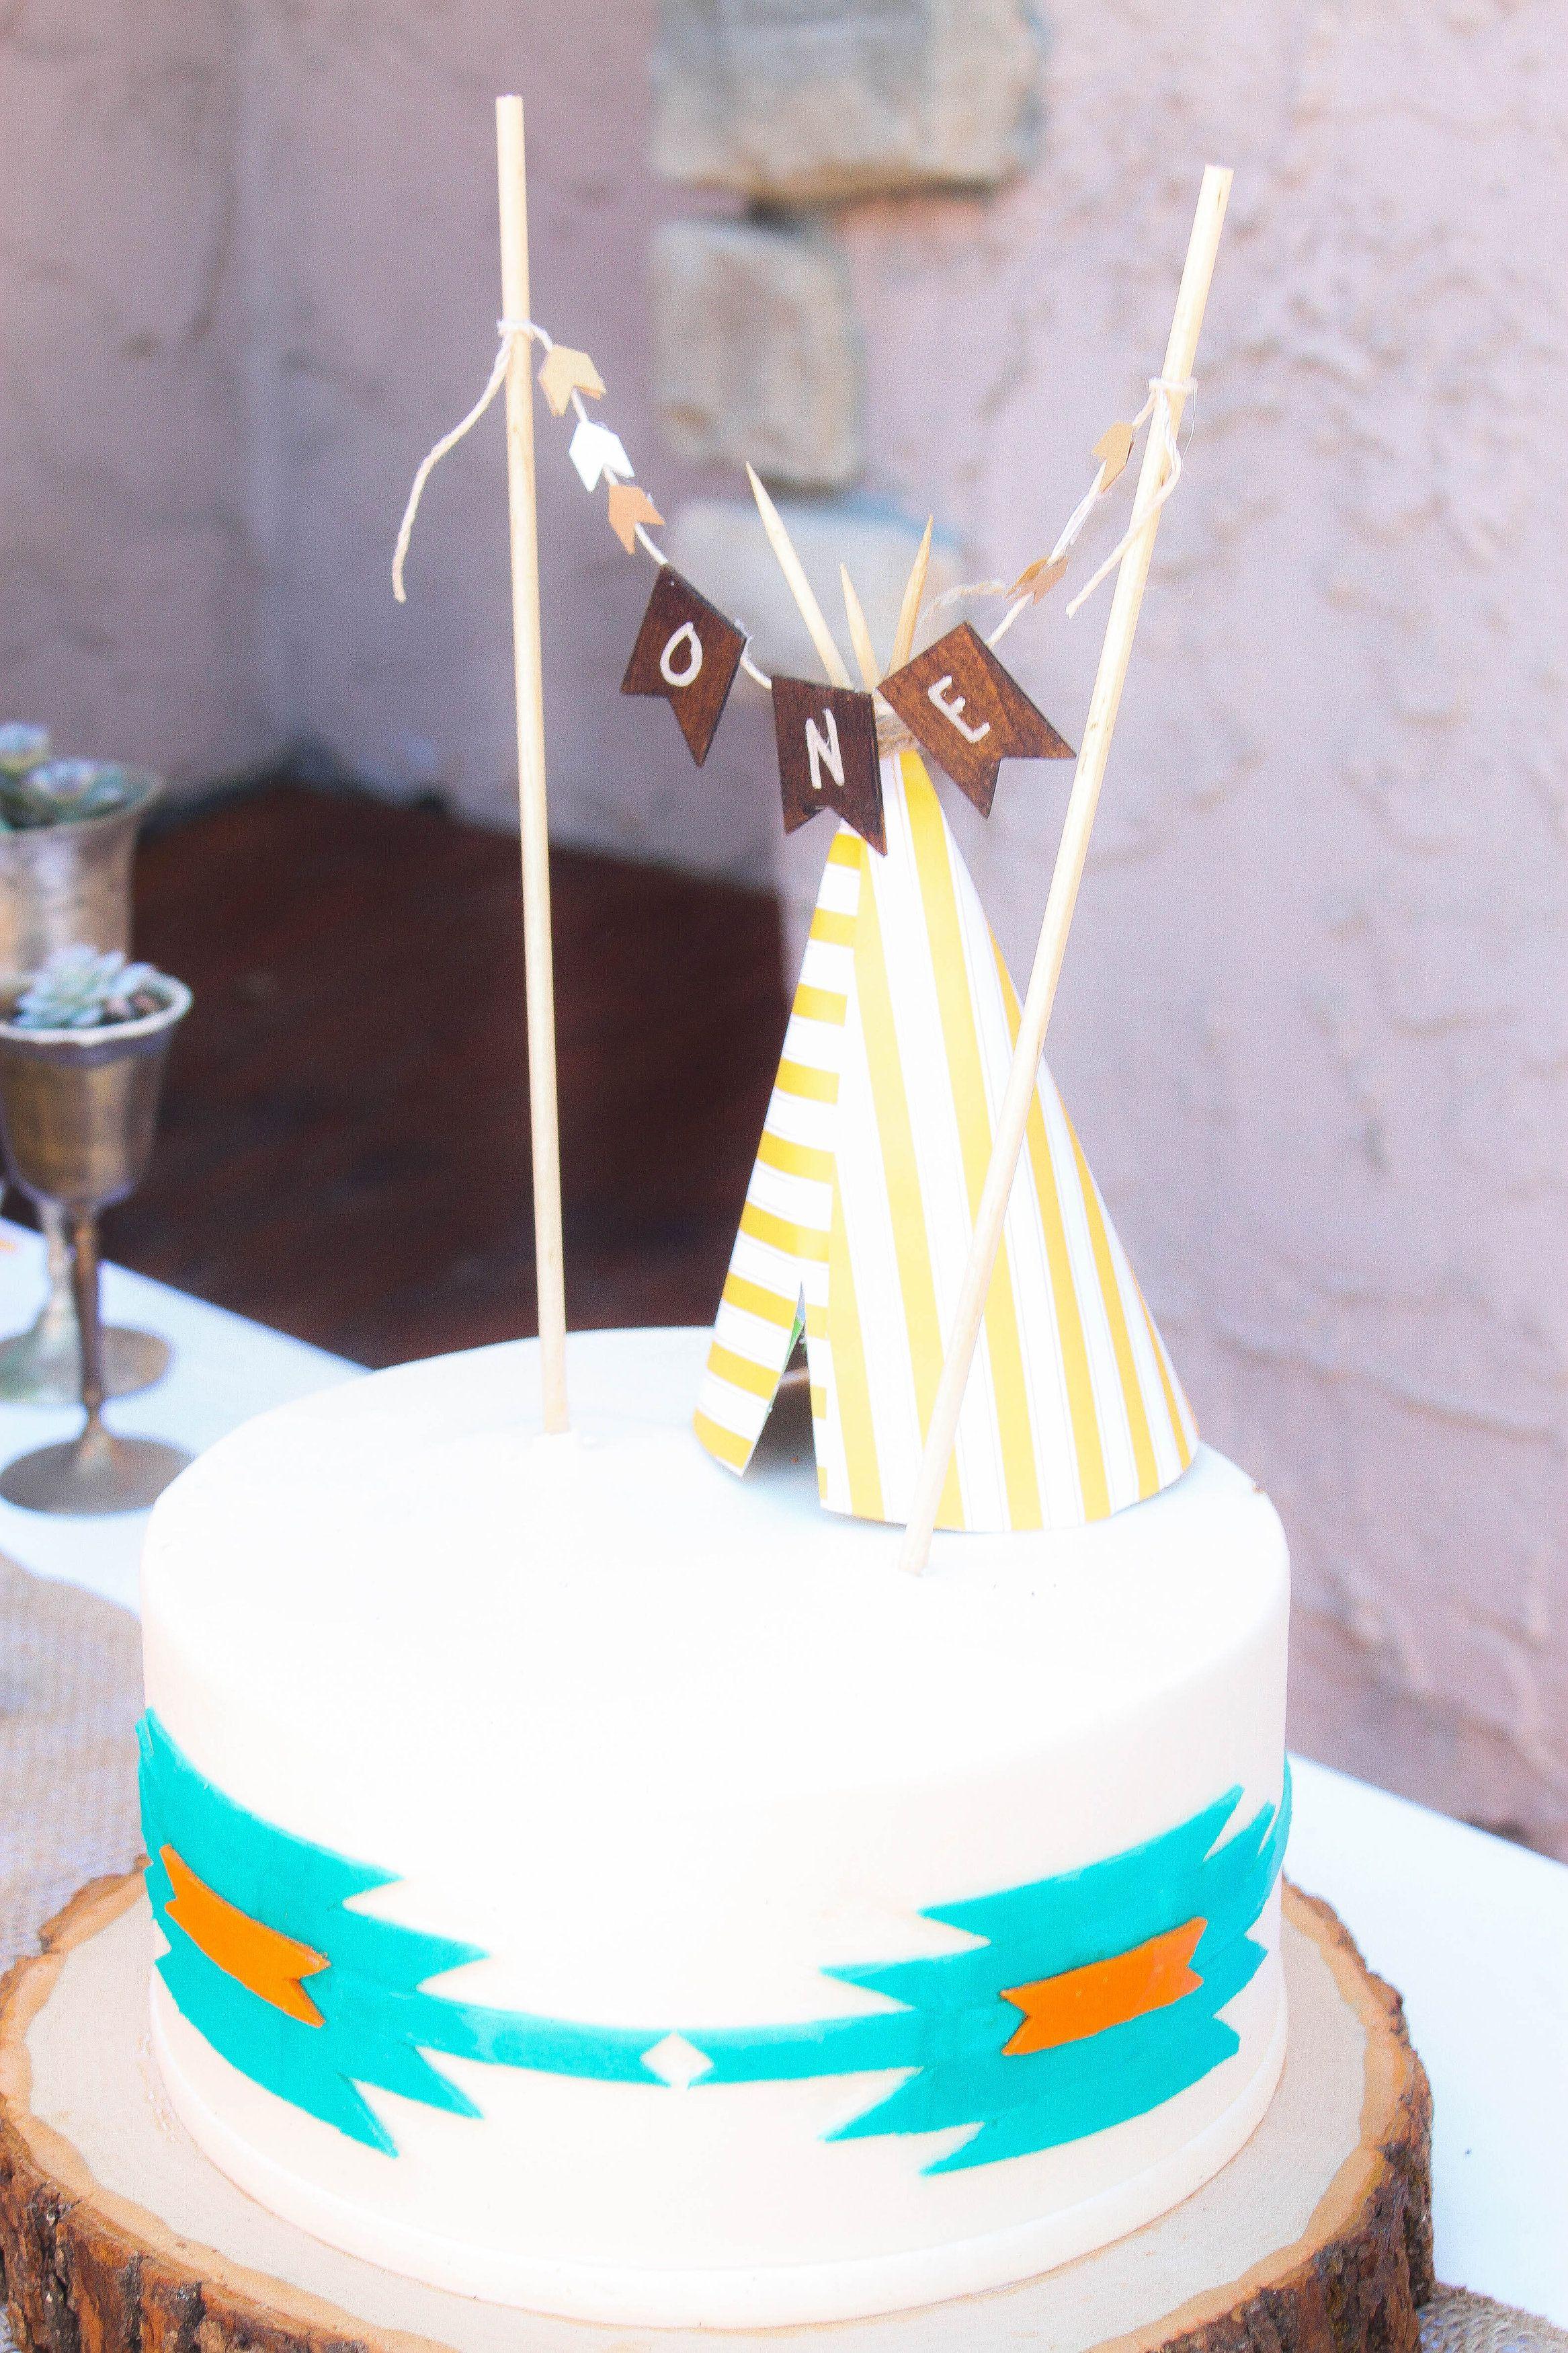 teepee cake Teepe Cake Teepees Cake Smash Cake Baby